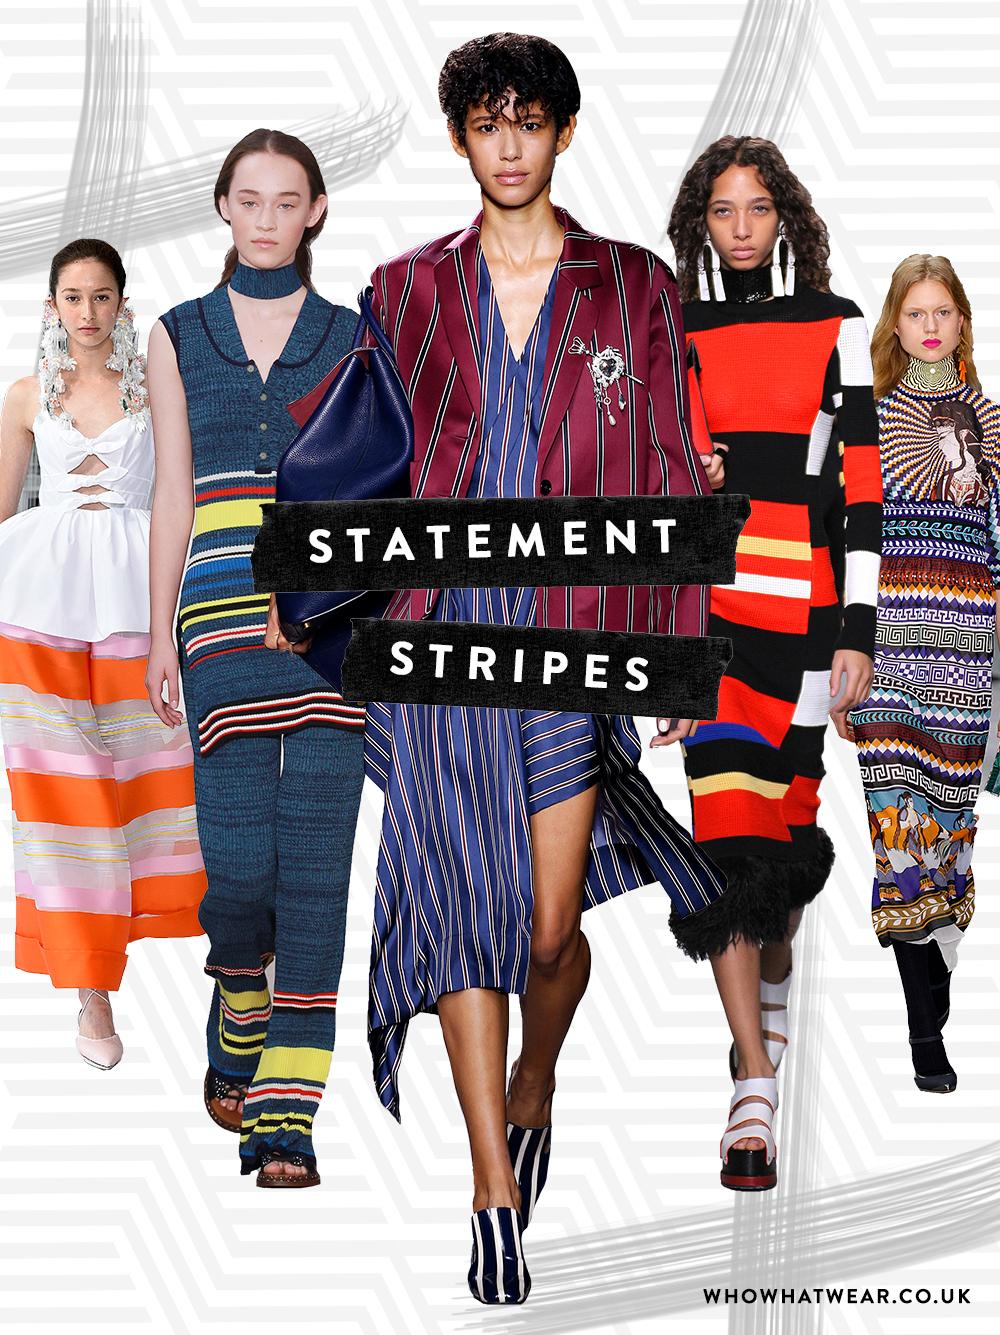 UK-Collage-Statement-Stripes.jpg